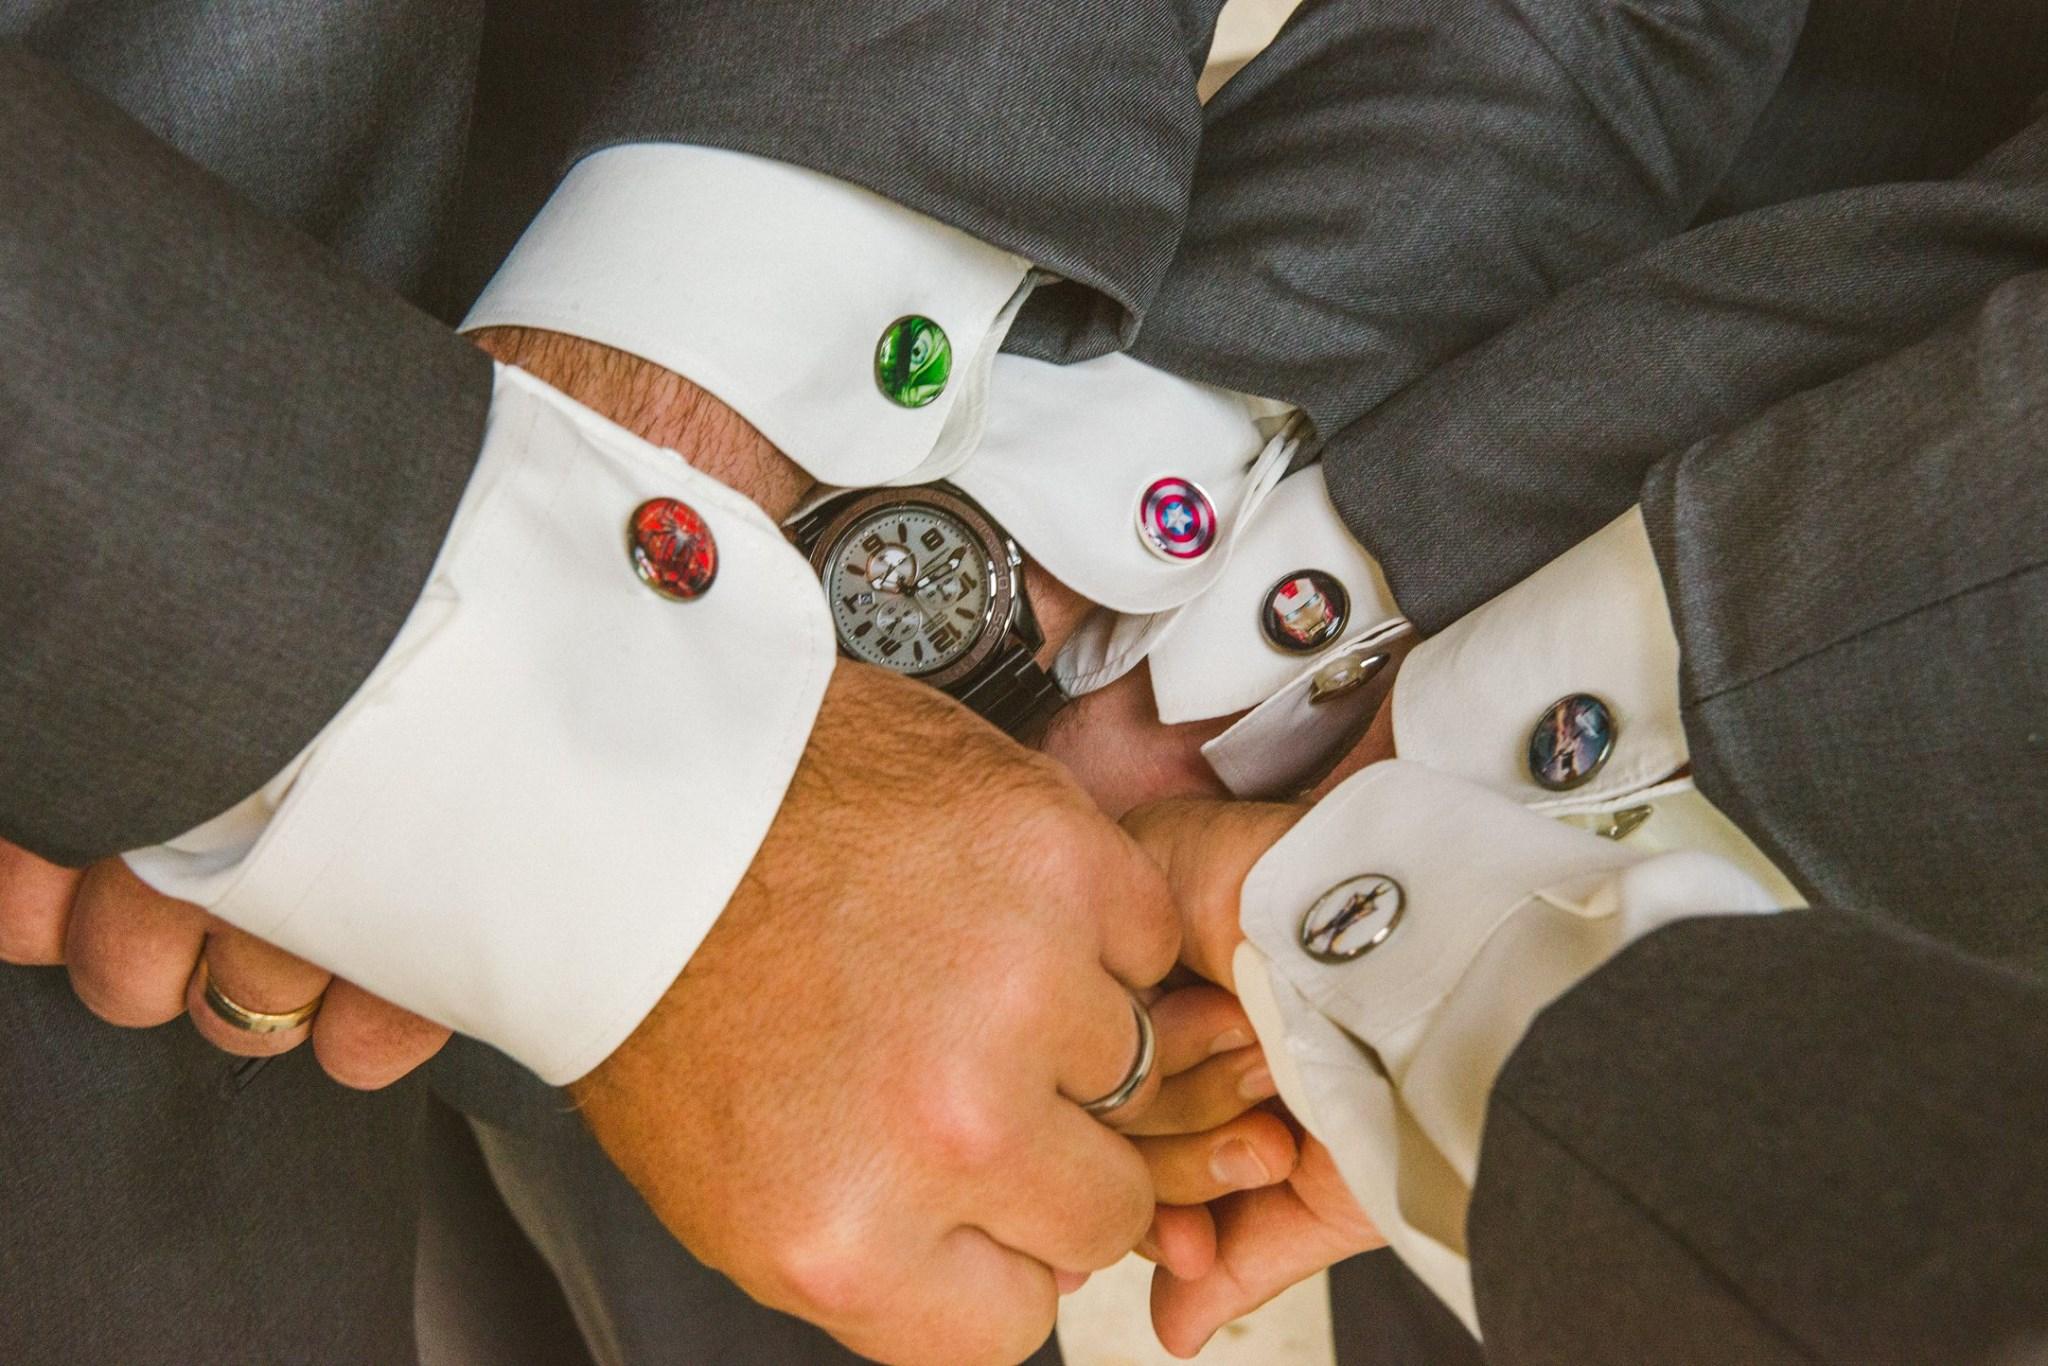 slipknot_goat_head_s_new_logo_cuff_links_men_weddings_grooms_groomsmen_gifts_dads_graduations_cufflinks_5.jpg